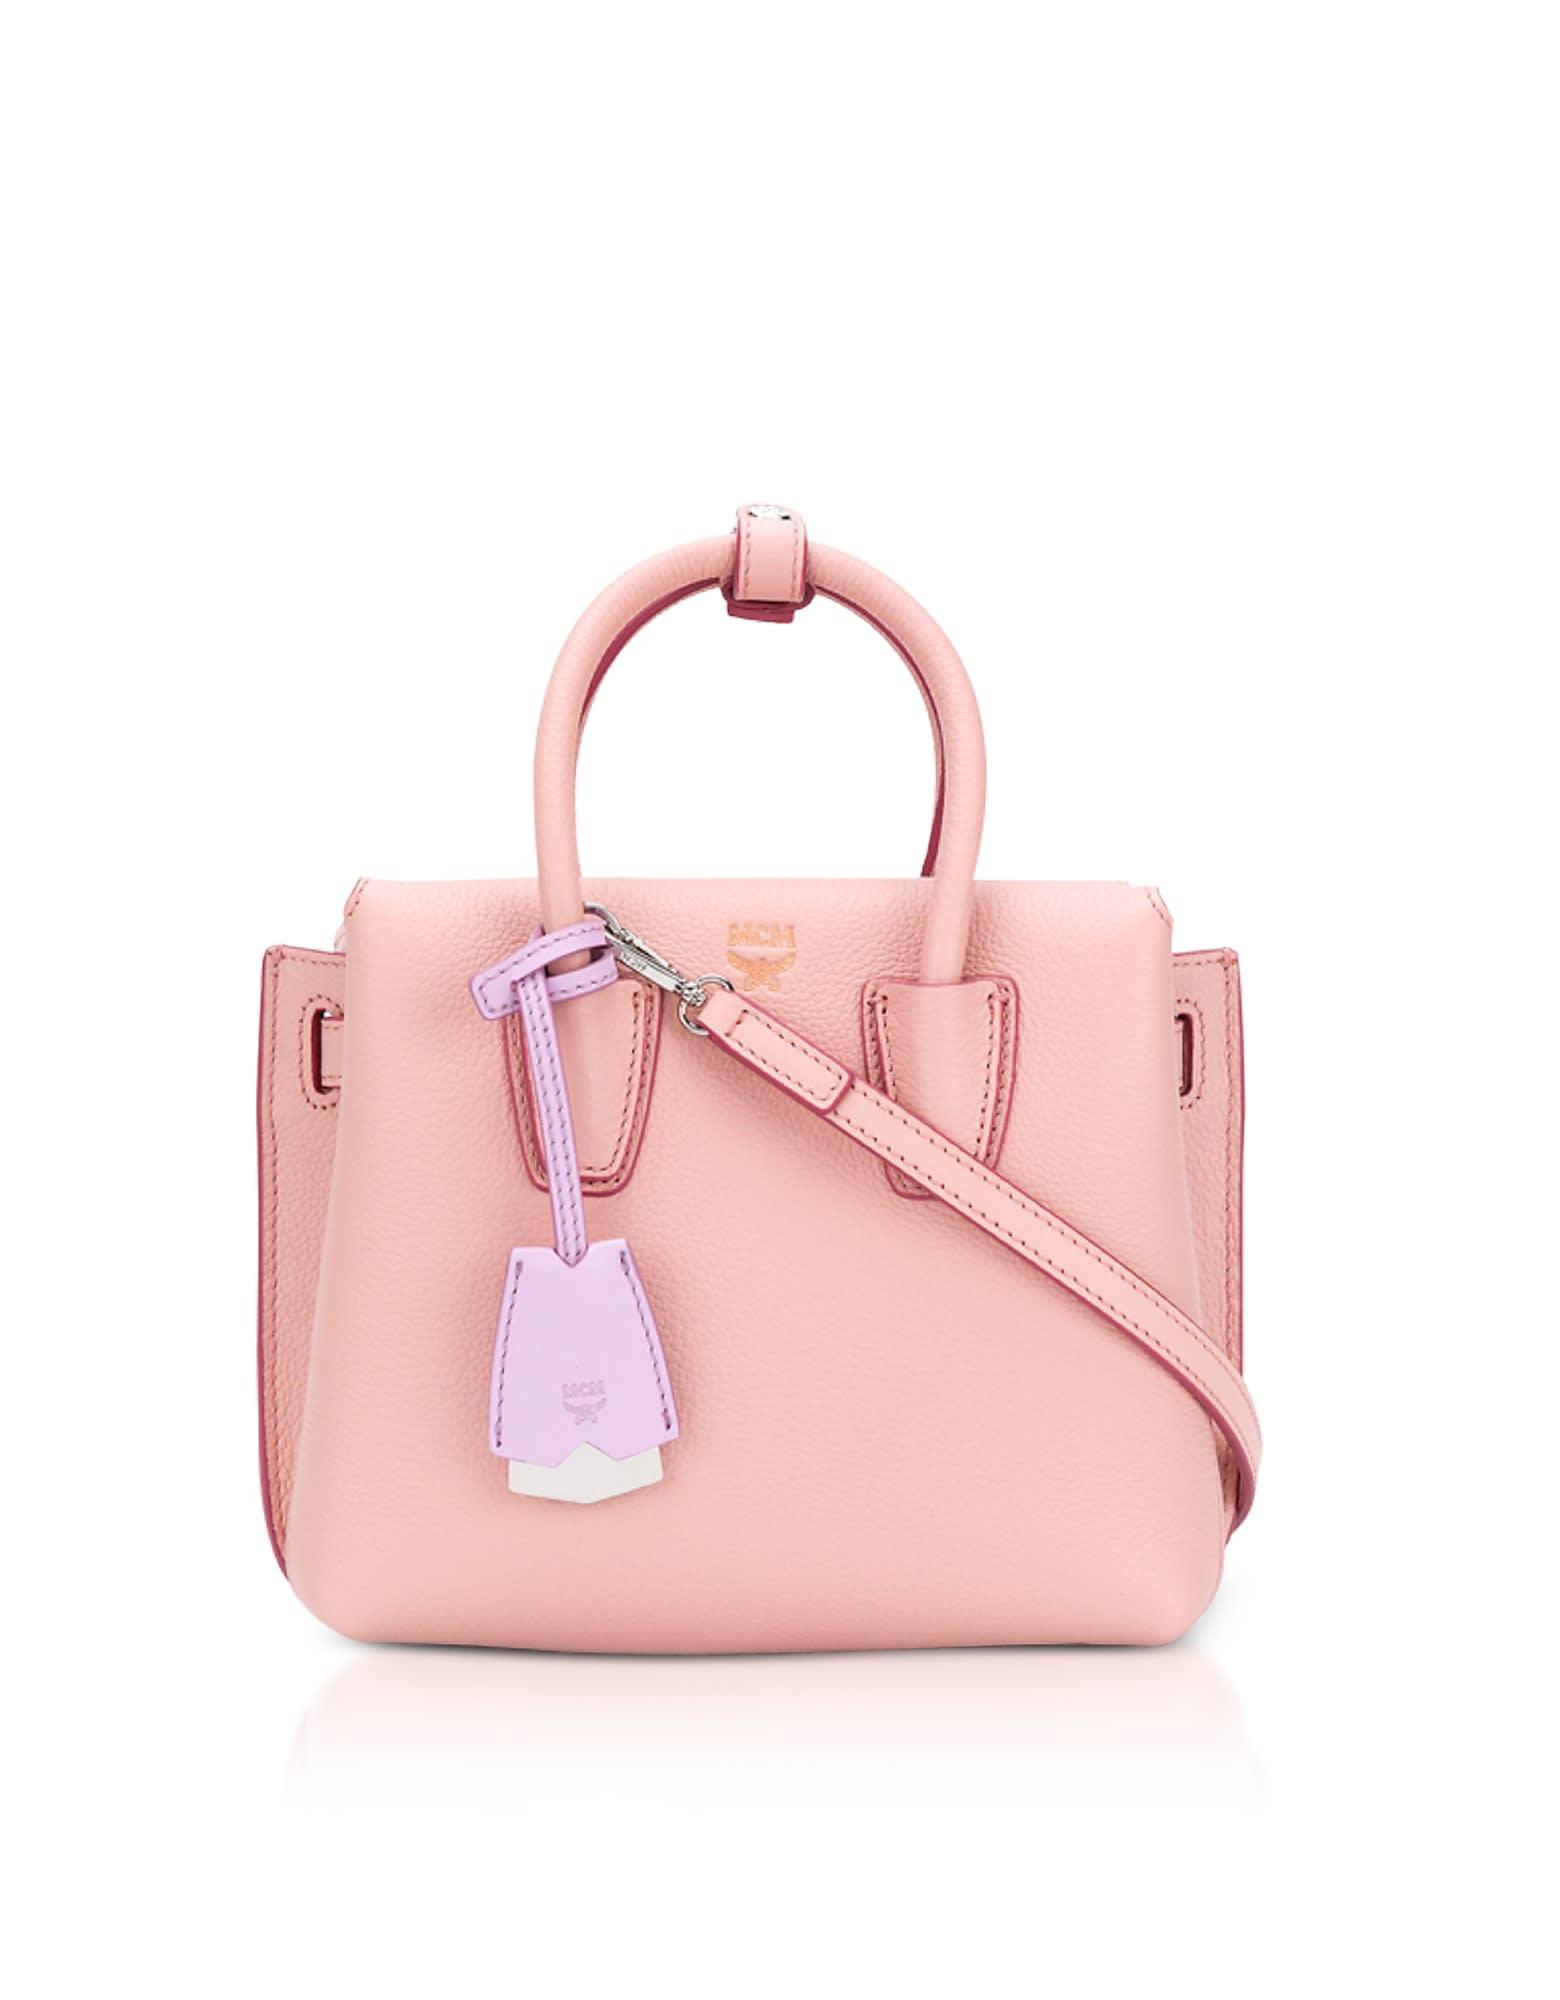 Mcm Totes Mcm Milla Pink Blush Leather Small Tote Bag